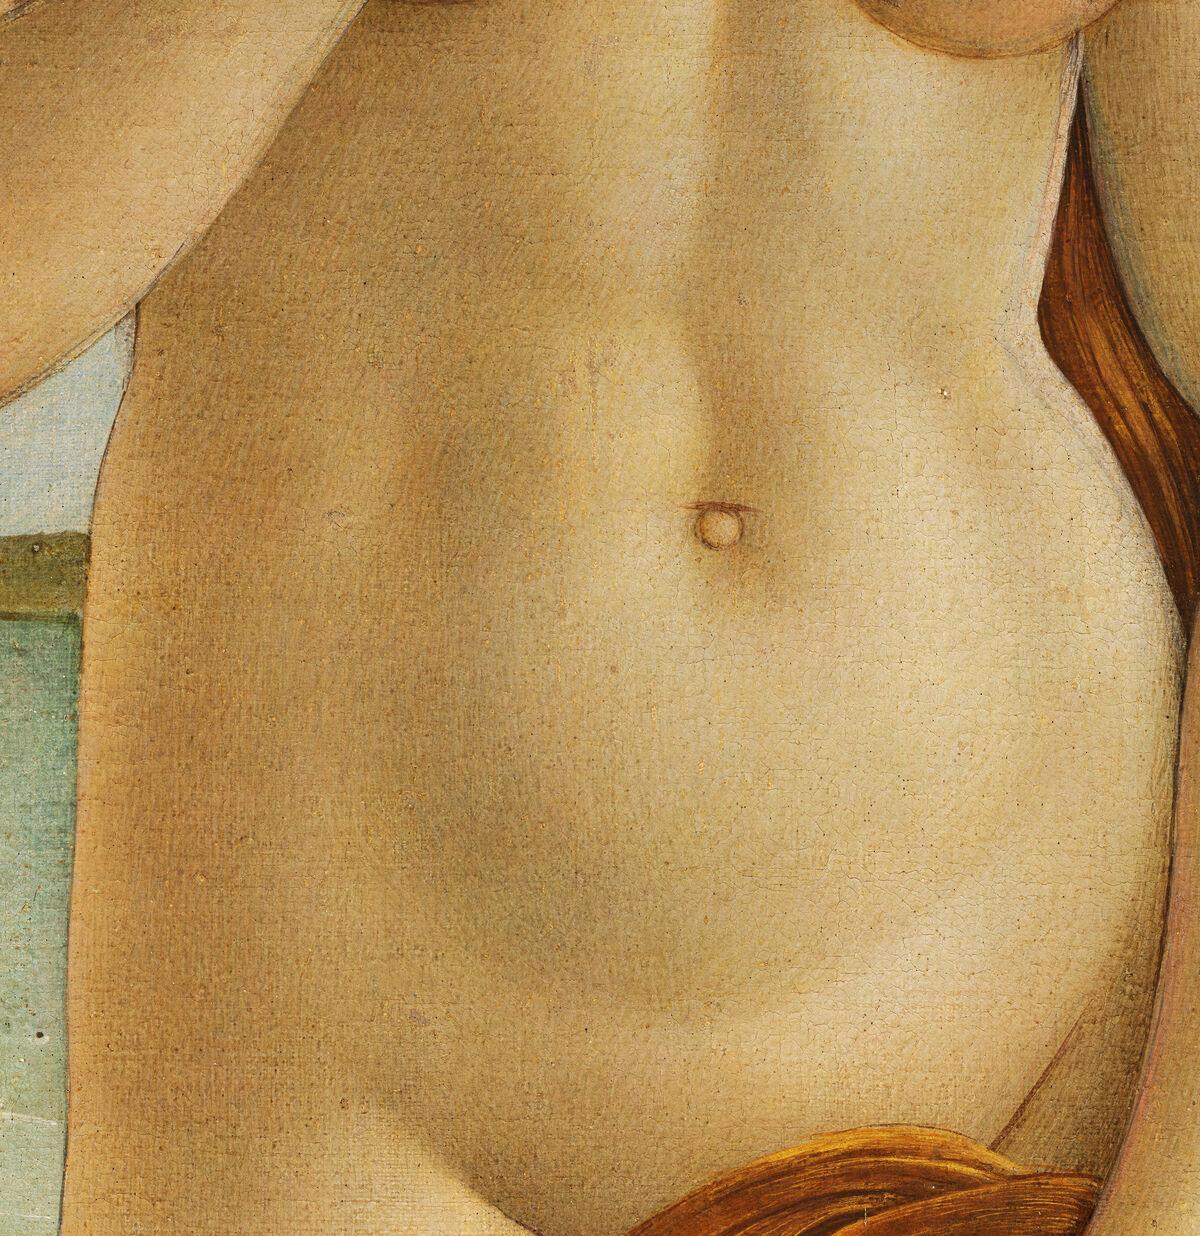 Sandro Botticelli, The Birth of Venus (detail), ca. 1486. Image via Wikimedia Commons.